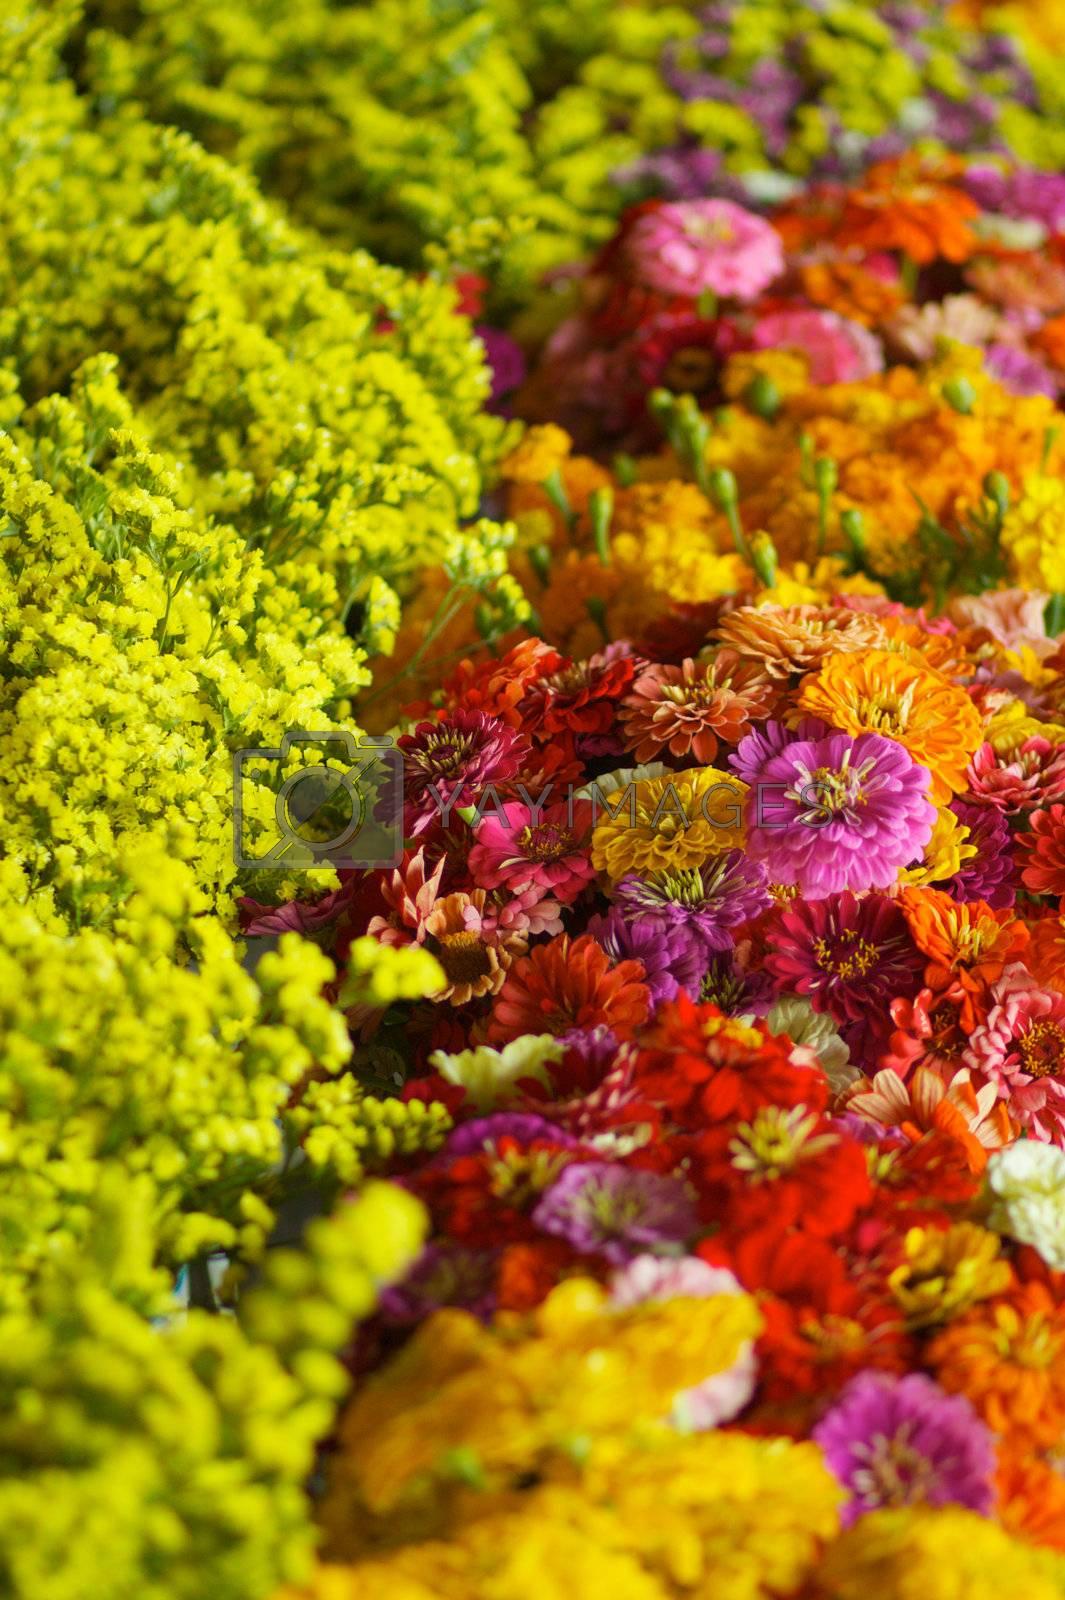 Royalty free image of Market flowers by bobkeenan